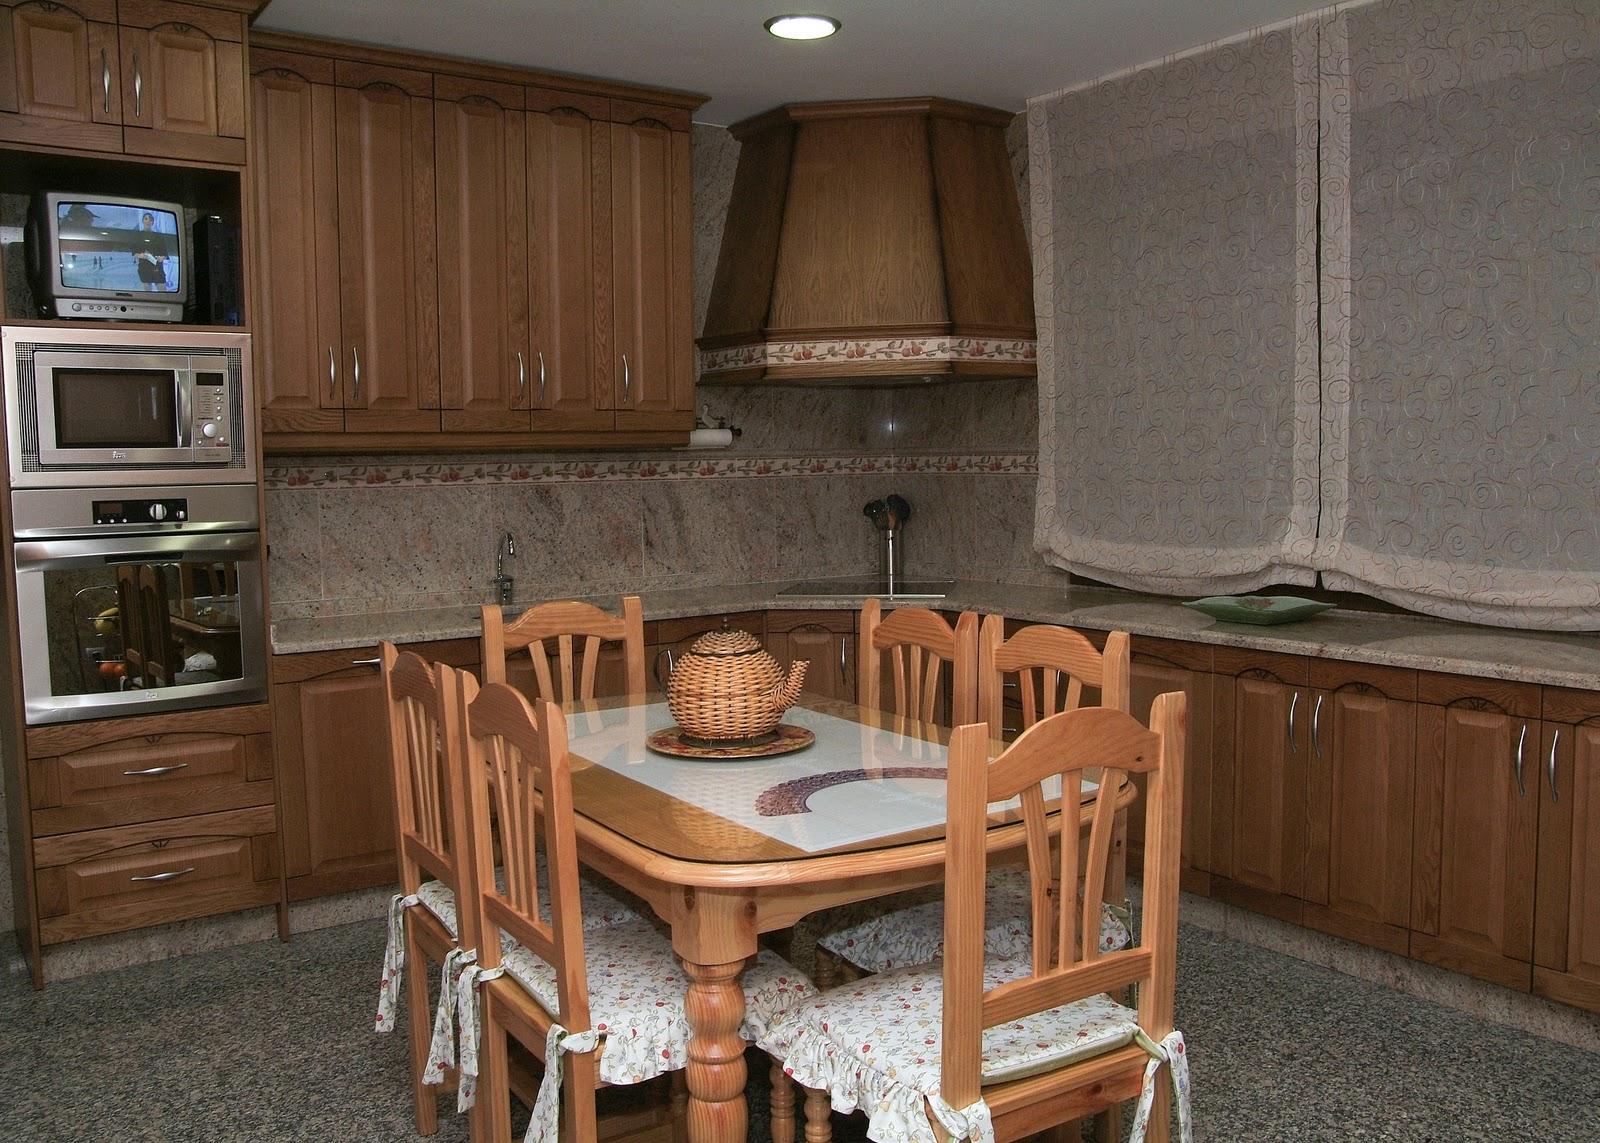 Cocisan chimenea artesanal cocina rustica for Cocinas con chimenea